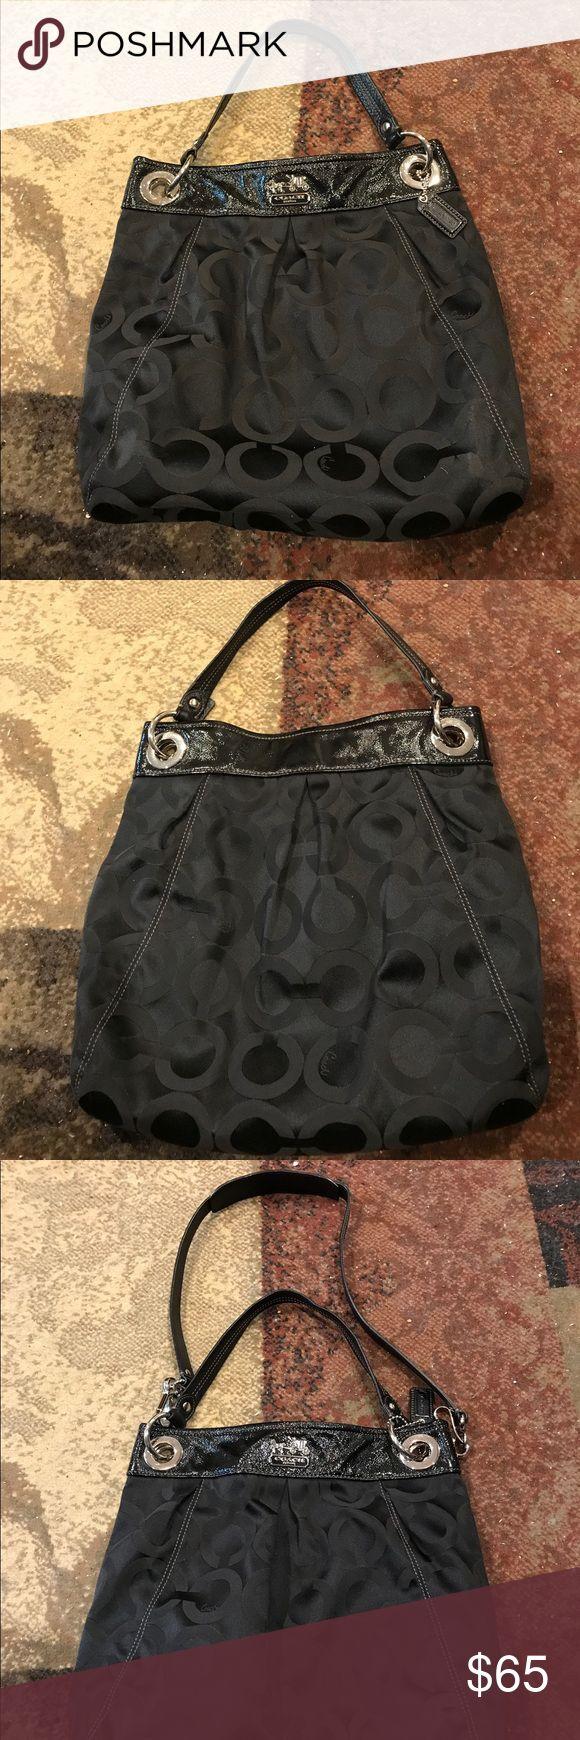 Coach hobo bag Black coach hobo bag, 16 x 14 x 7, never used, comes with longer strap. Coach Bags Hobos